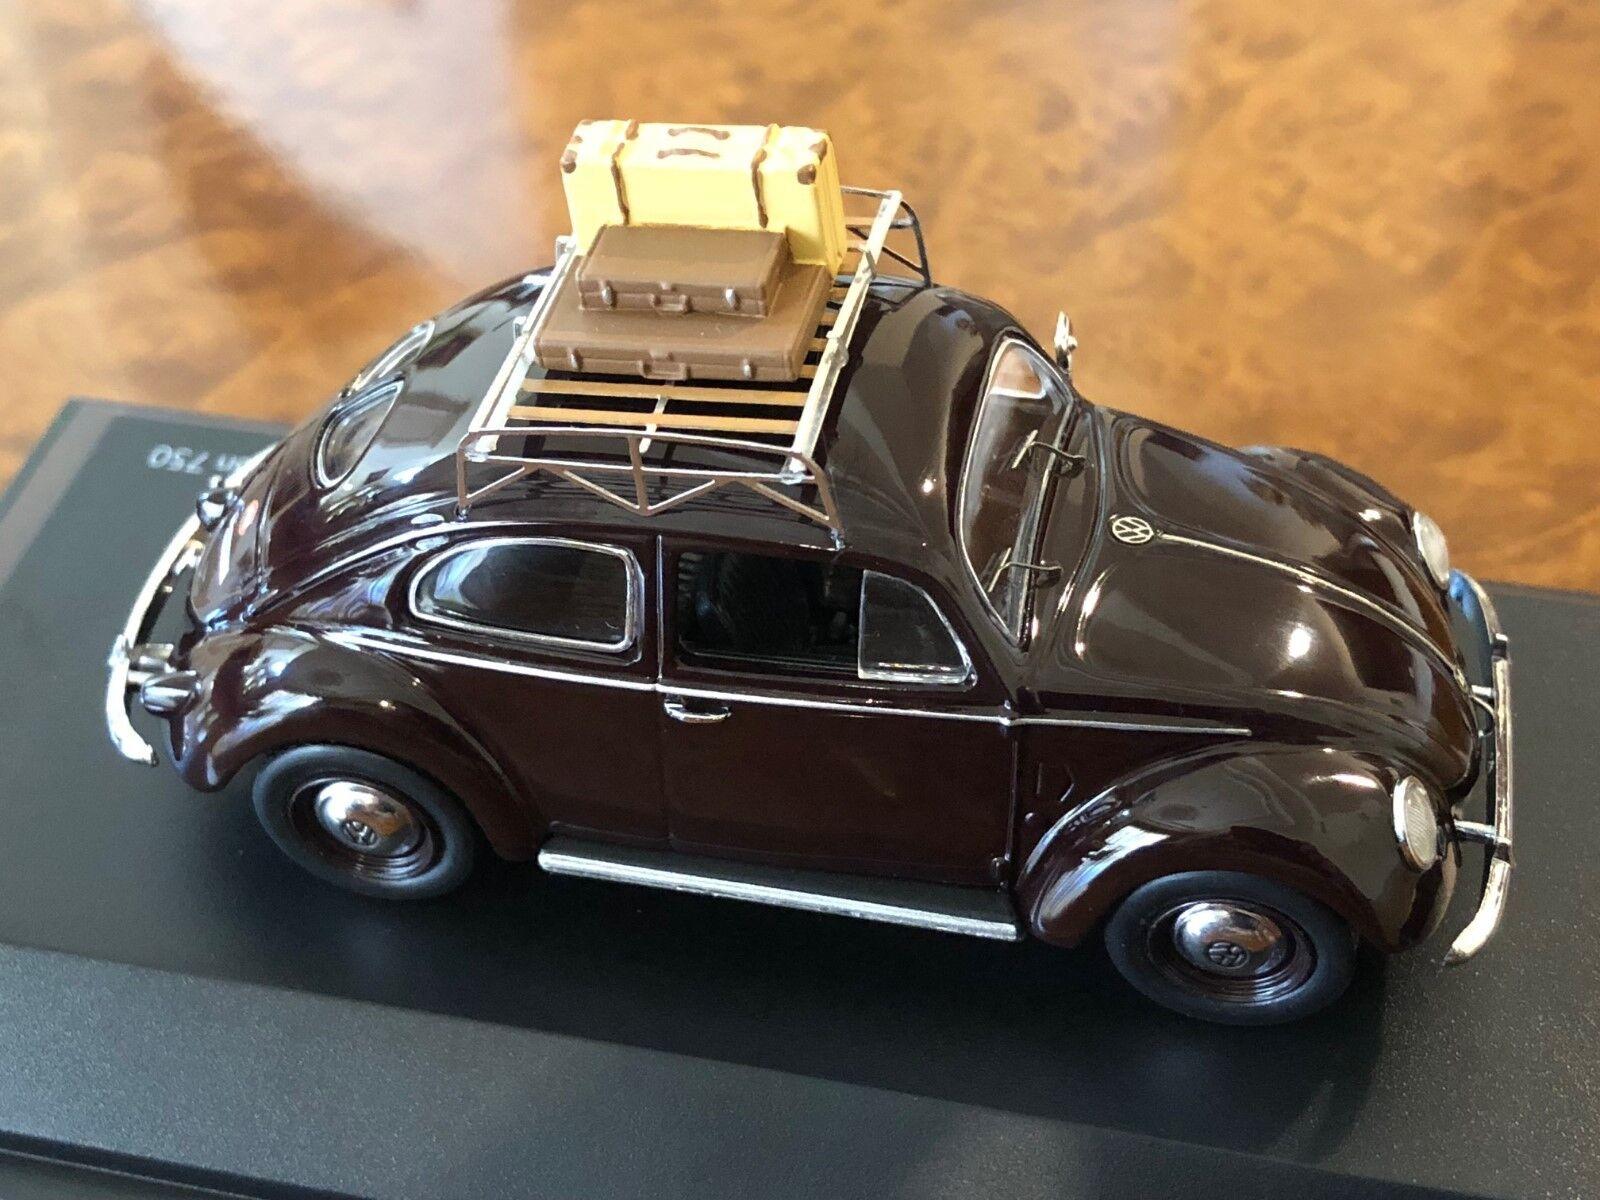 Schuco 1 43 43 43   VW Kafer - Beetle Split Window  Summer 1951    SHU00726 a43fd3